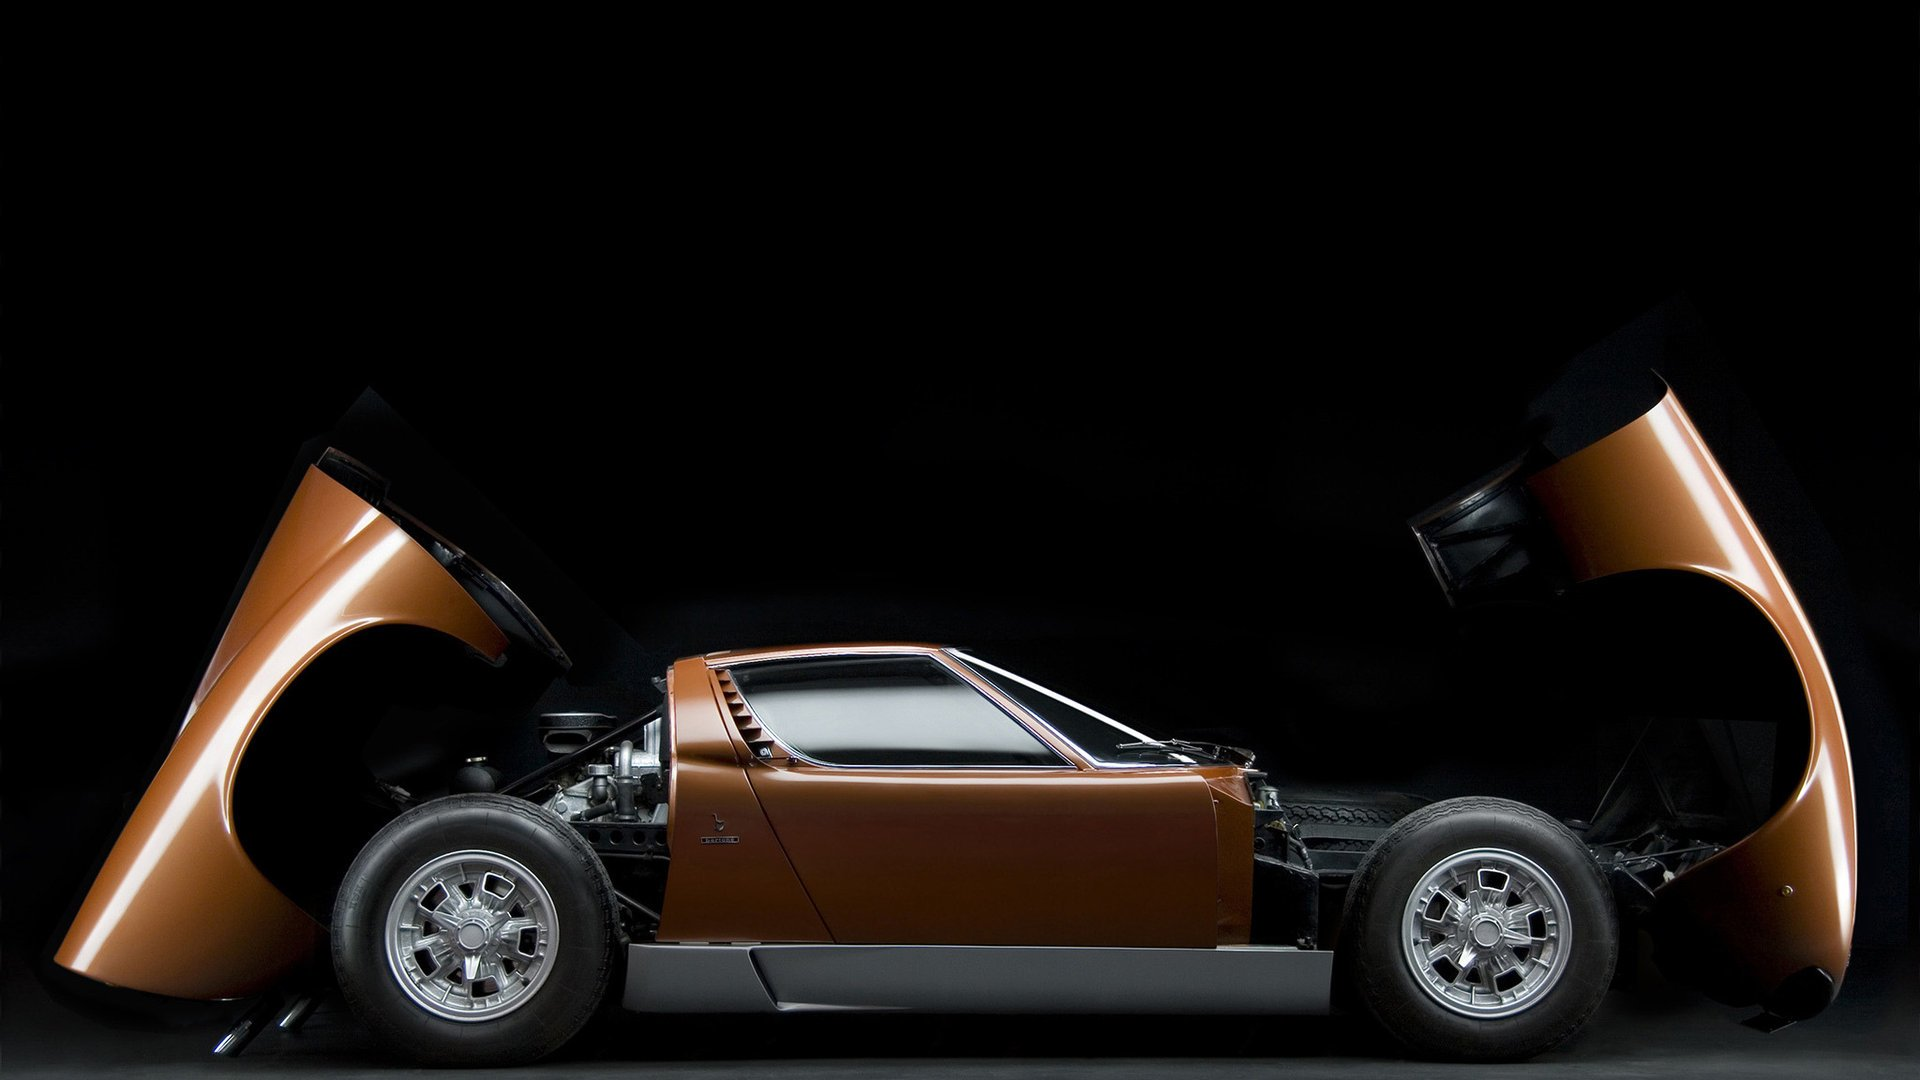 Lamborghini Miura Hd Wallpaper Background Image 1920x1080 Id